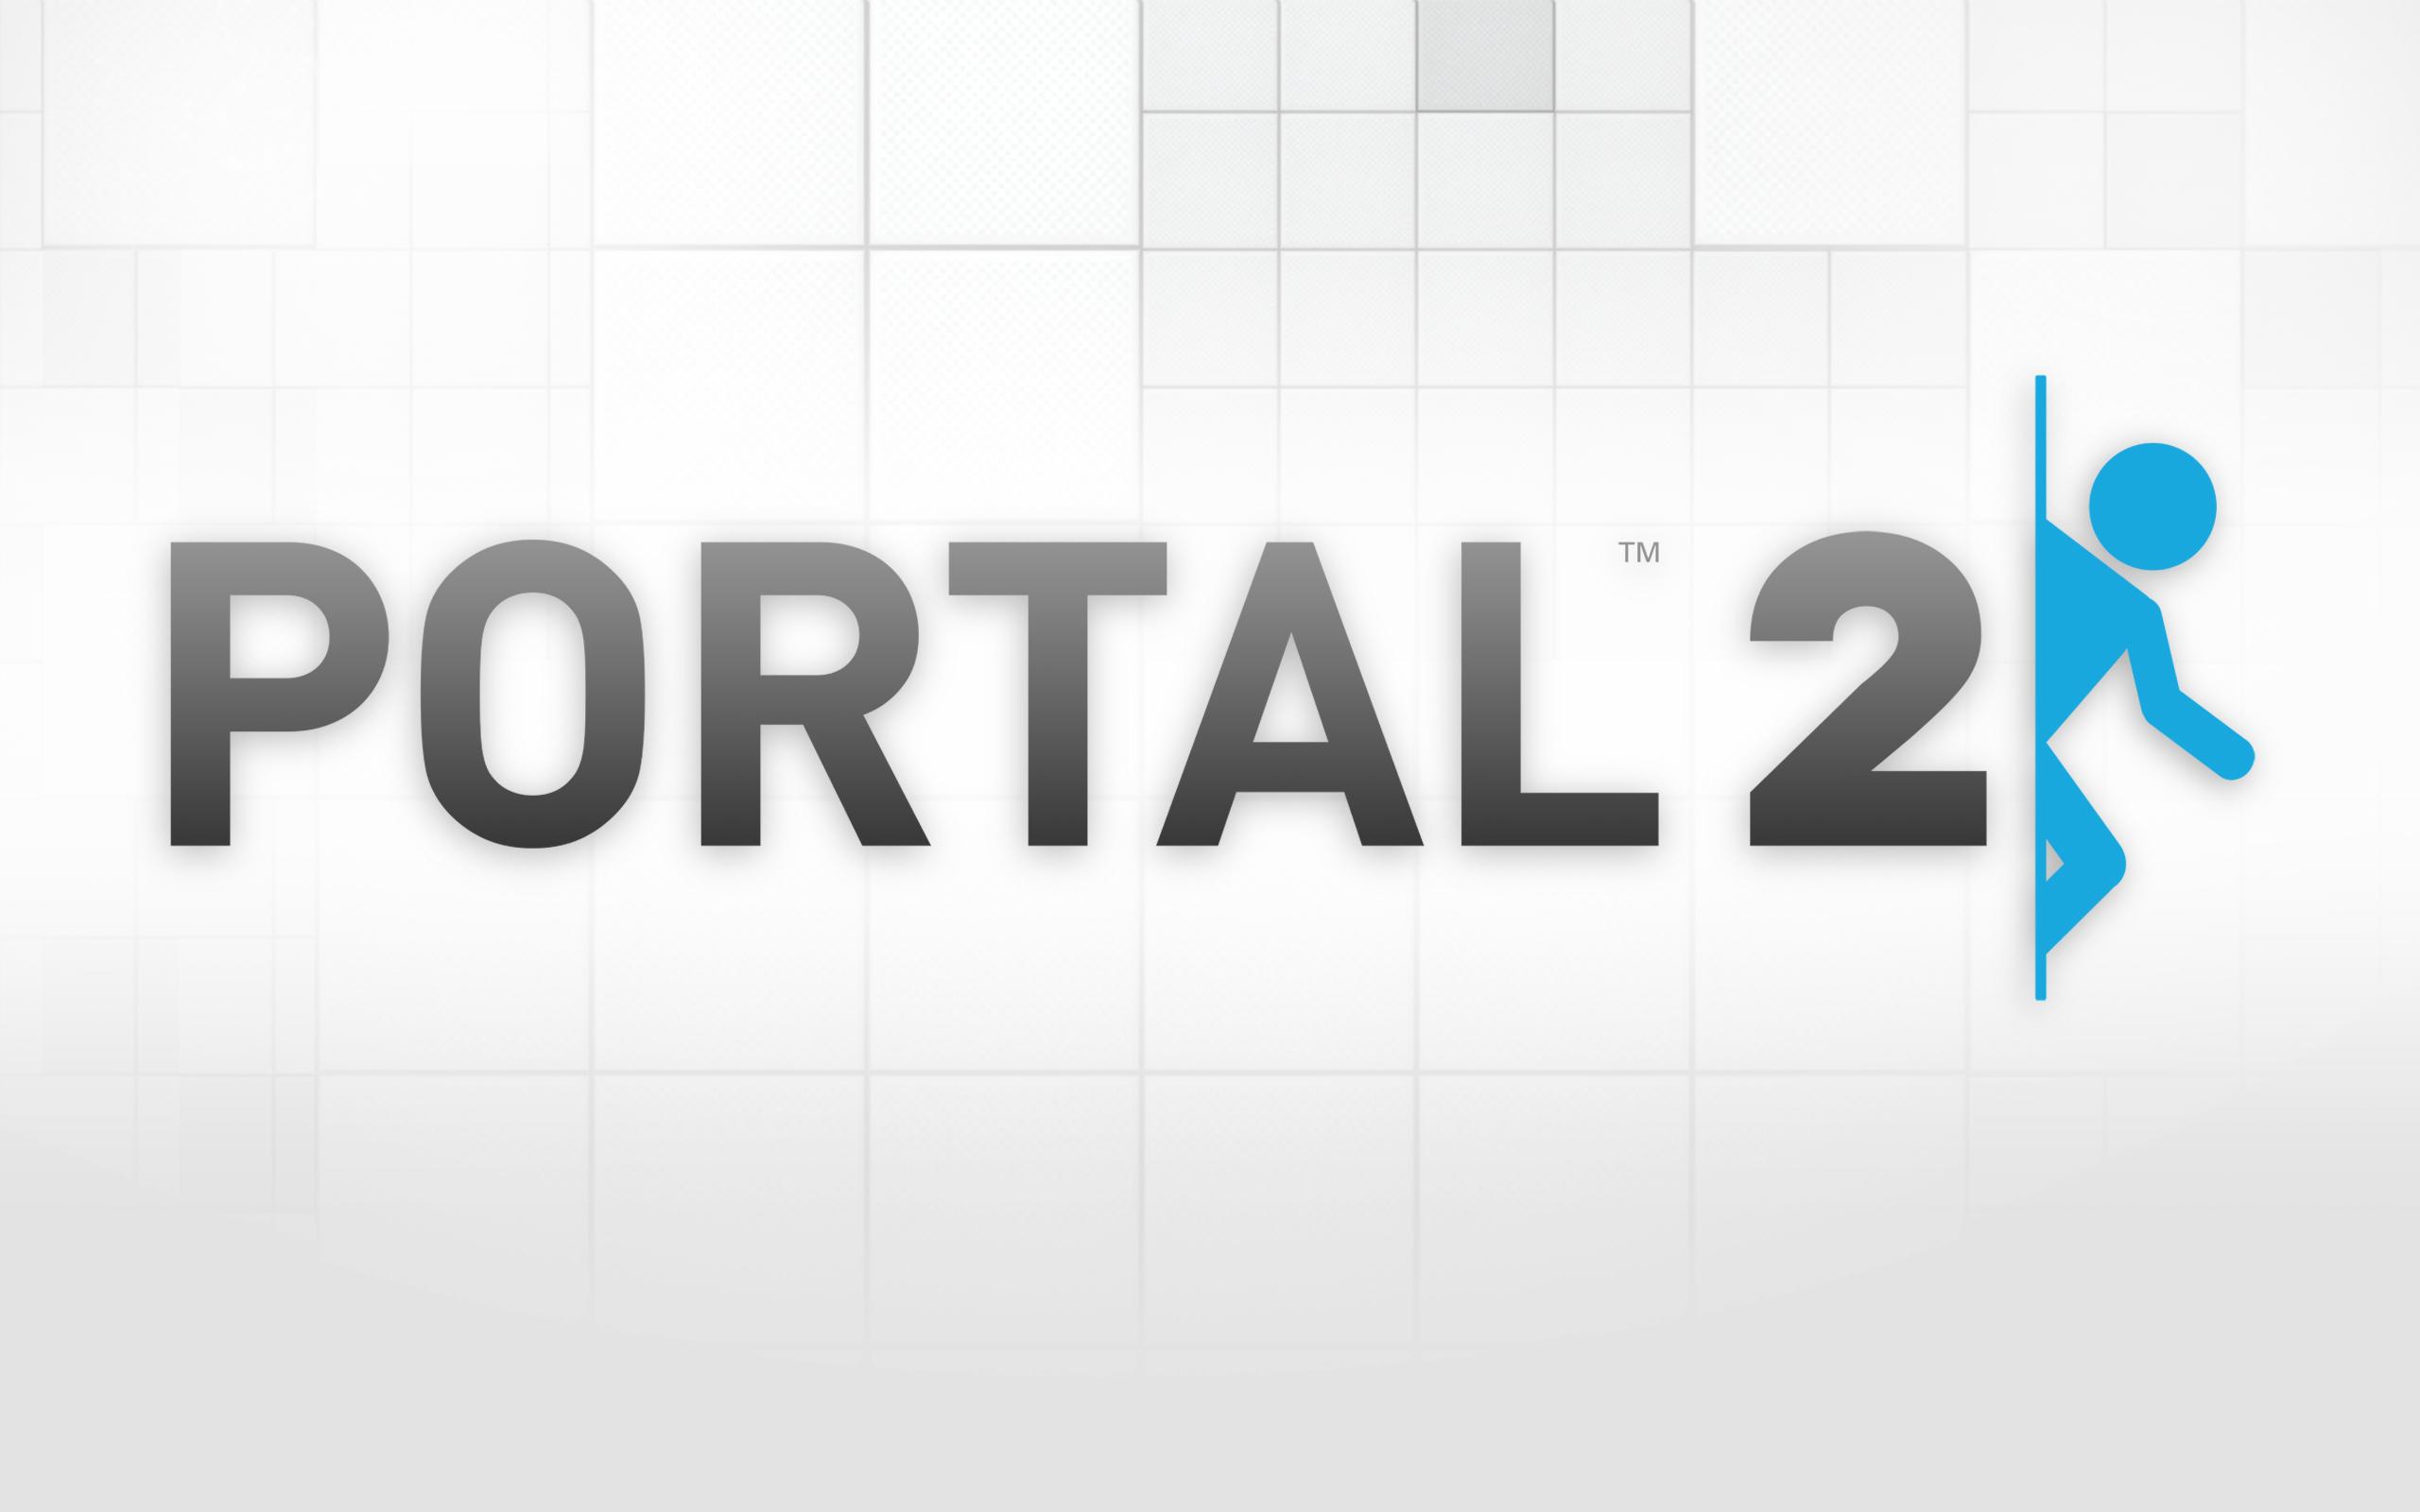 Portal 2 оригинал 1600x1200px. не пугайтесь плохому качеству картинки